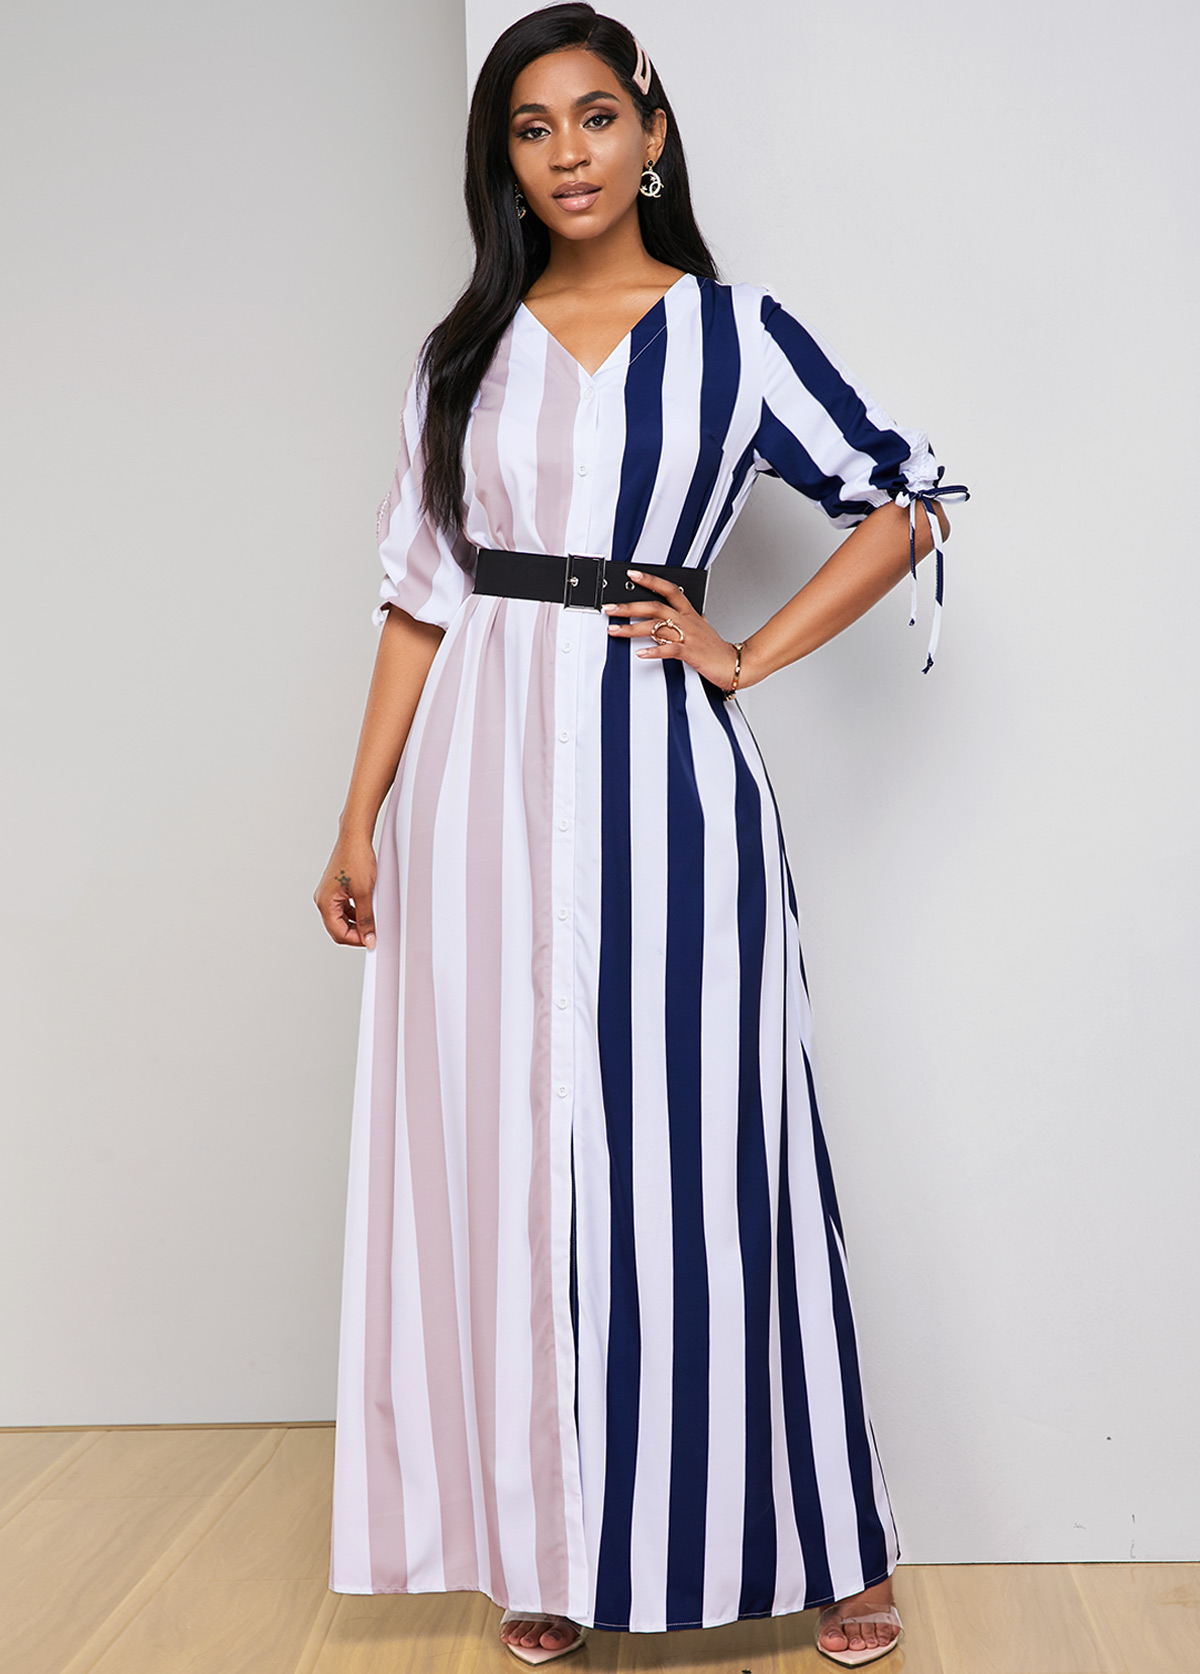 Contrast Striped Drawstring Sleeve V Neck Maxi Dress